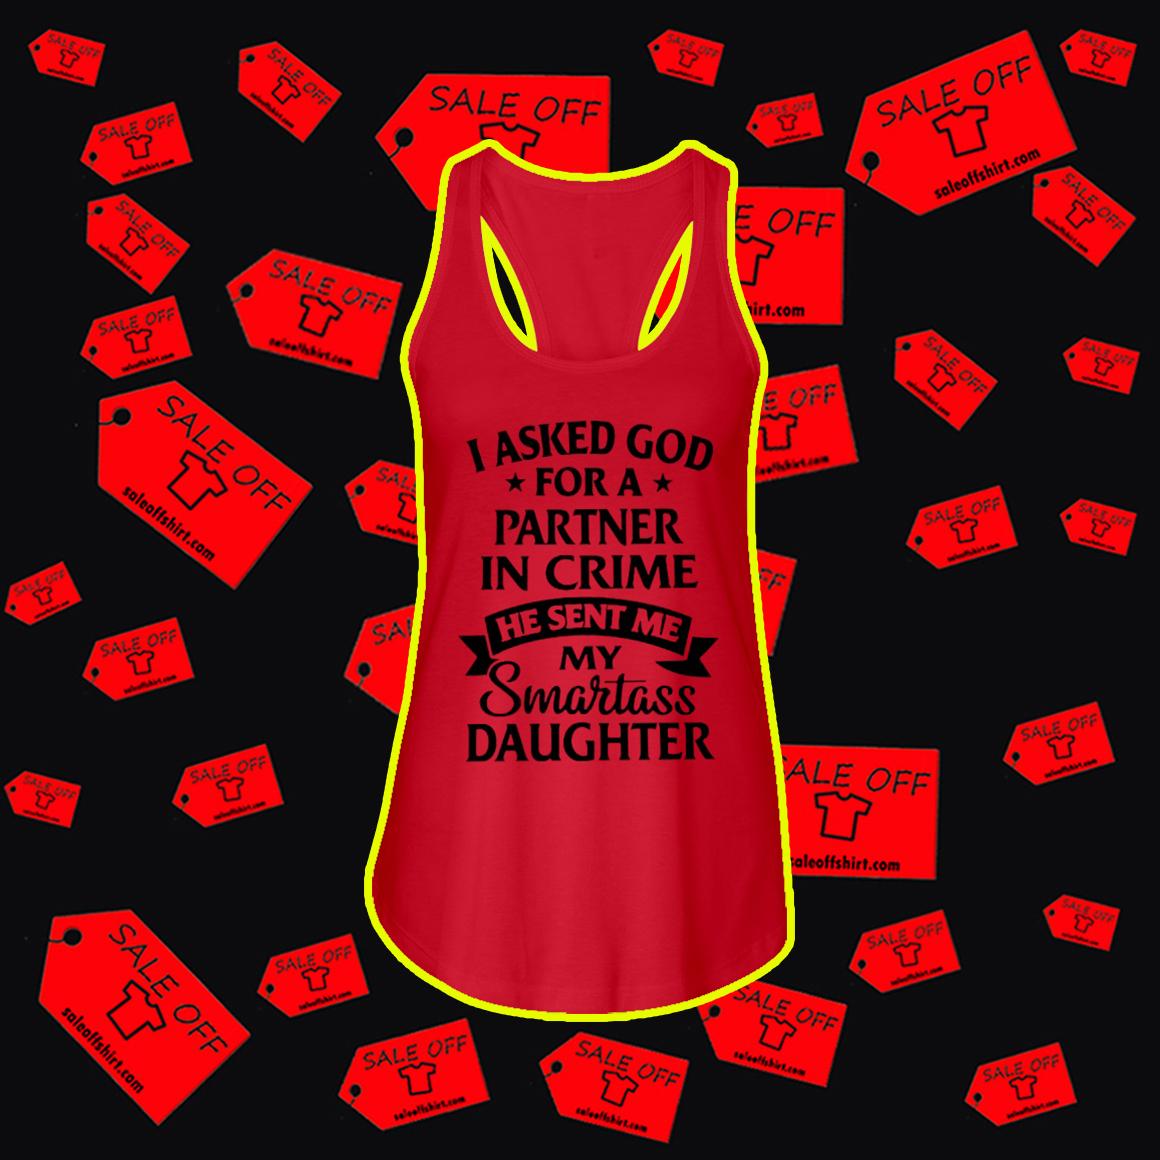 I Asked God For A Partner In Crime He Sent Me Smartass Daughter tank top